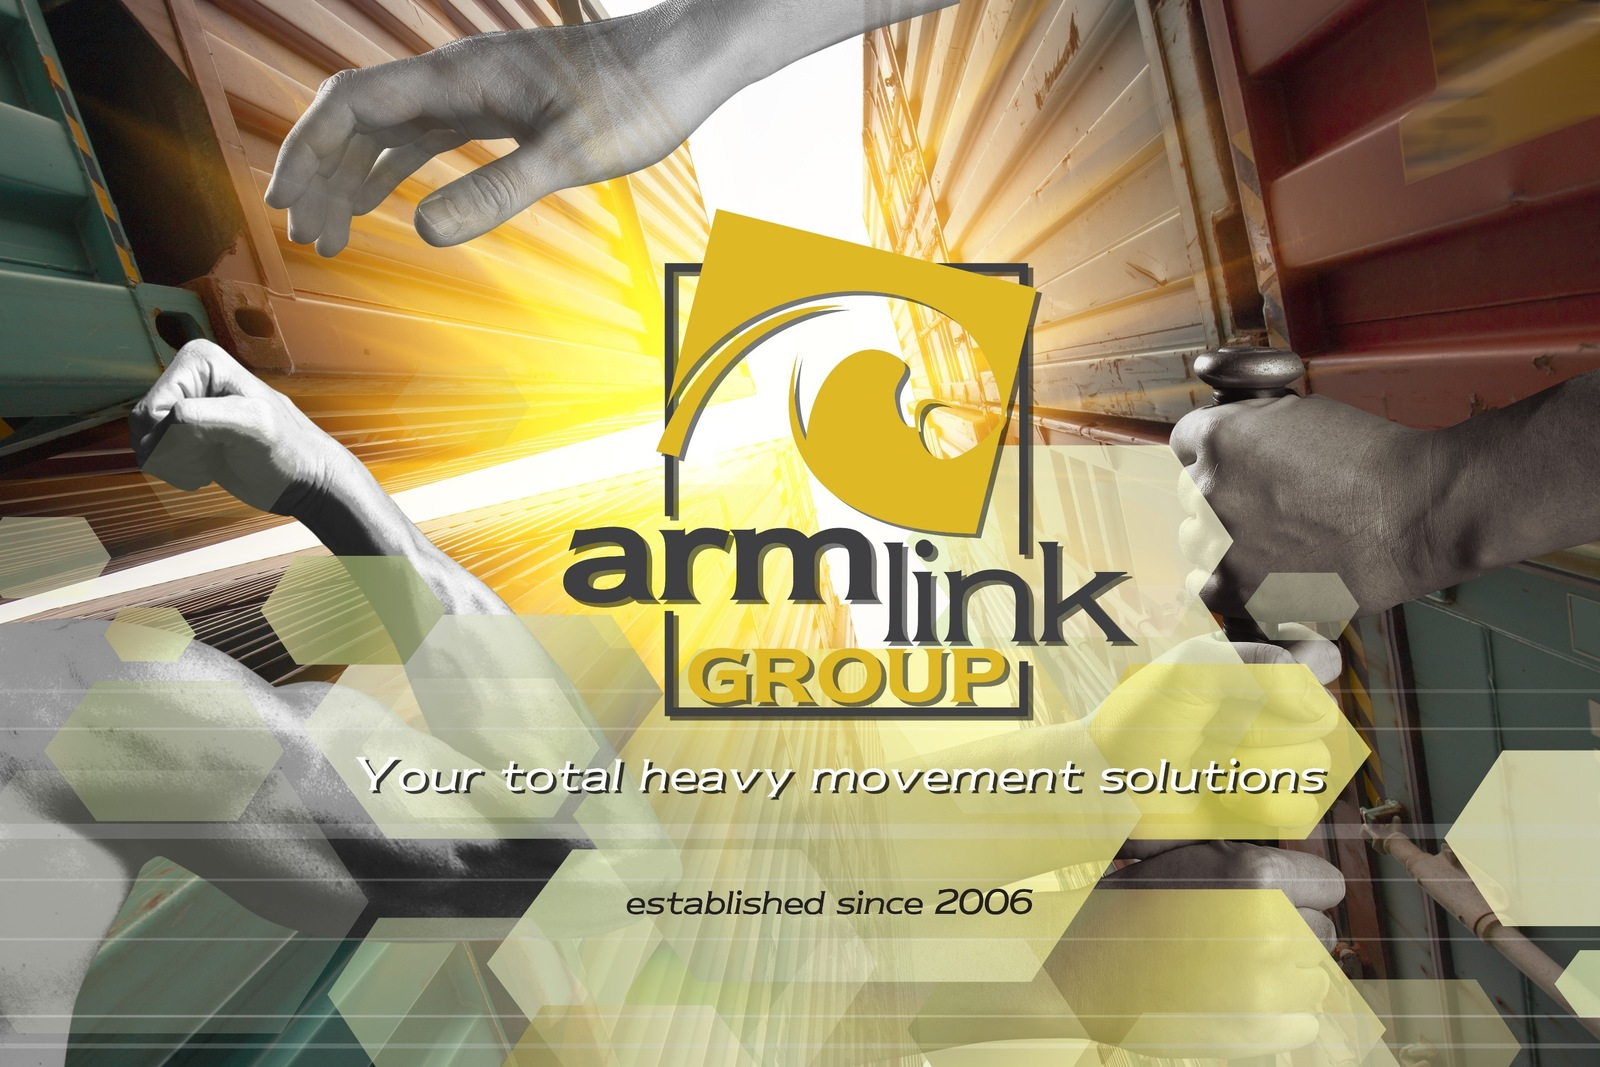 Armlink Group